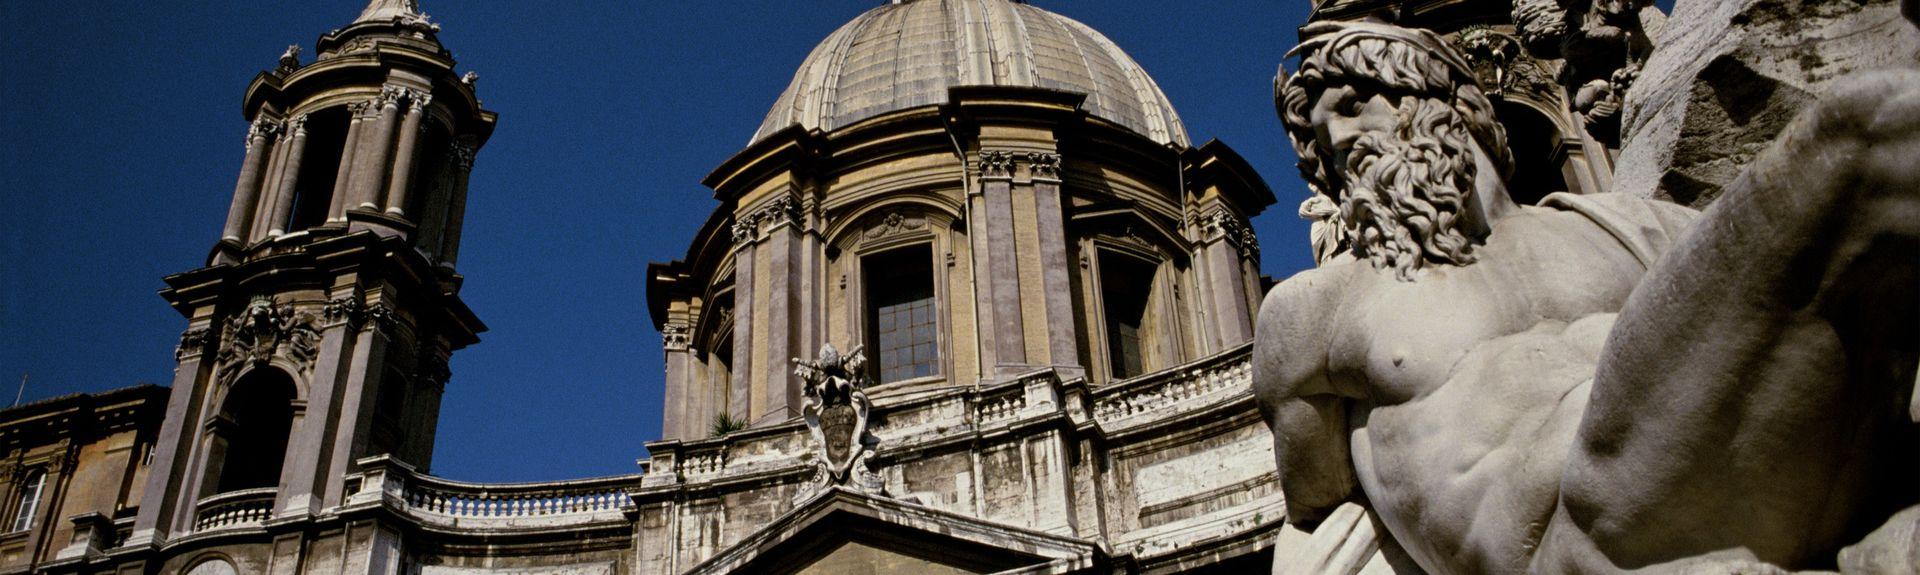 Centro de la ciudad de Roma, Roma, Lacio, Italia